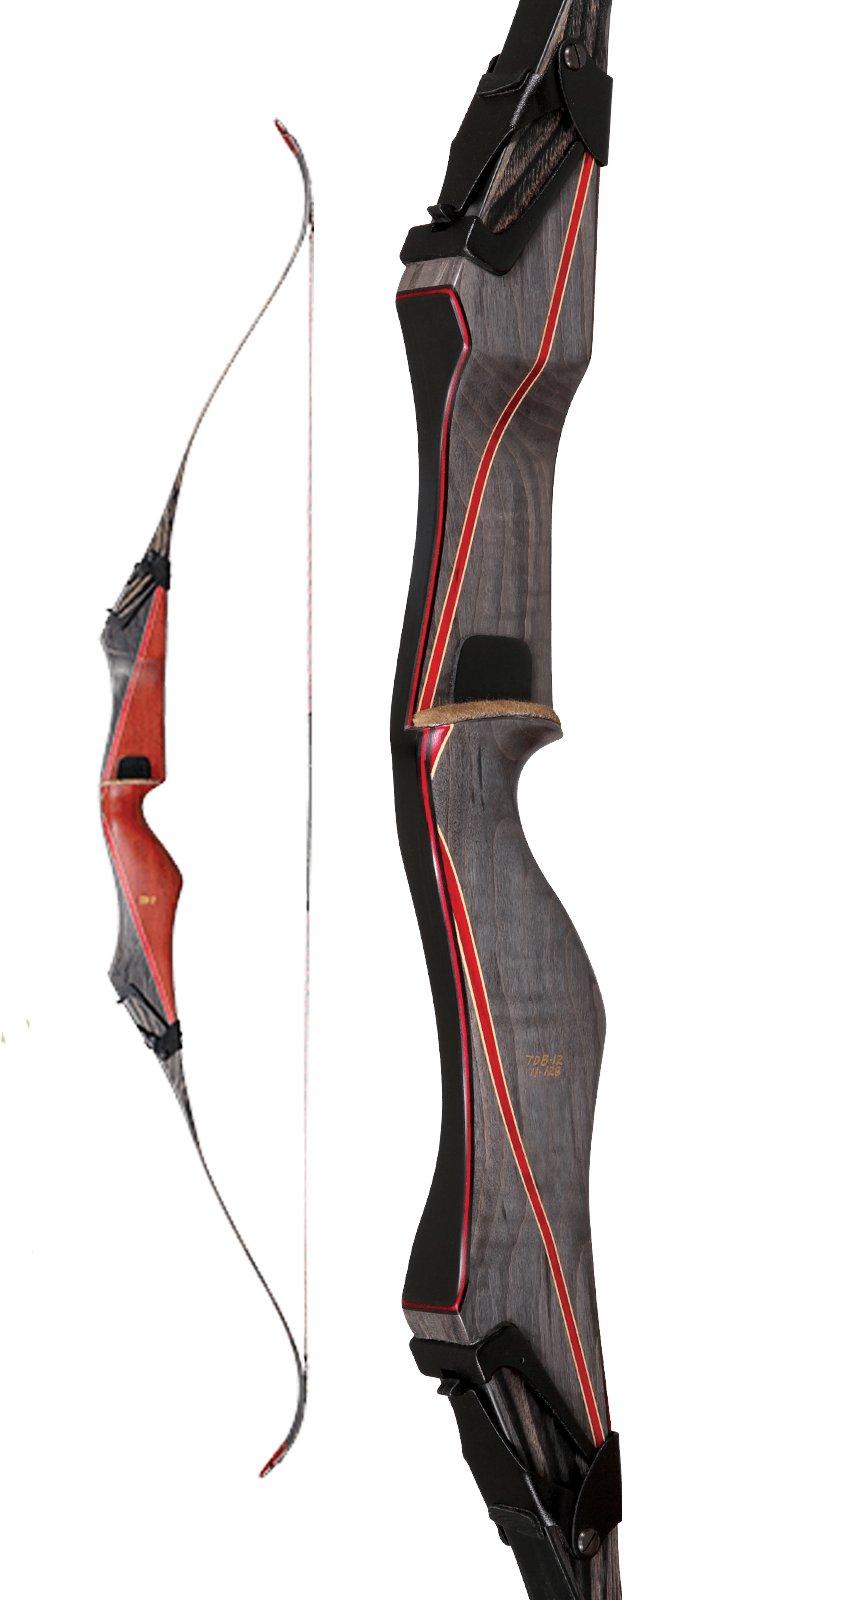 Bear Archery The TakeDown Bogenset LH (auf Anfrage) / B (long)